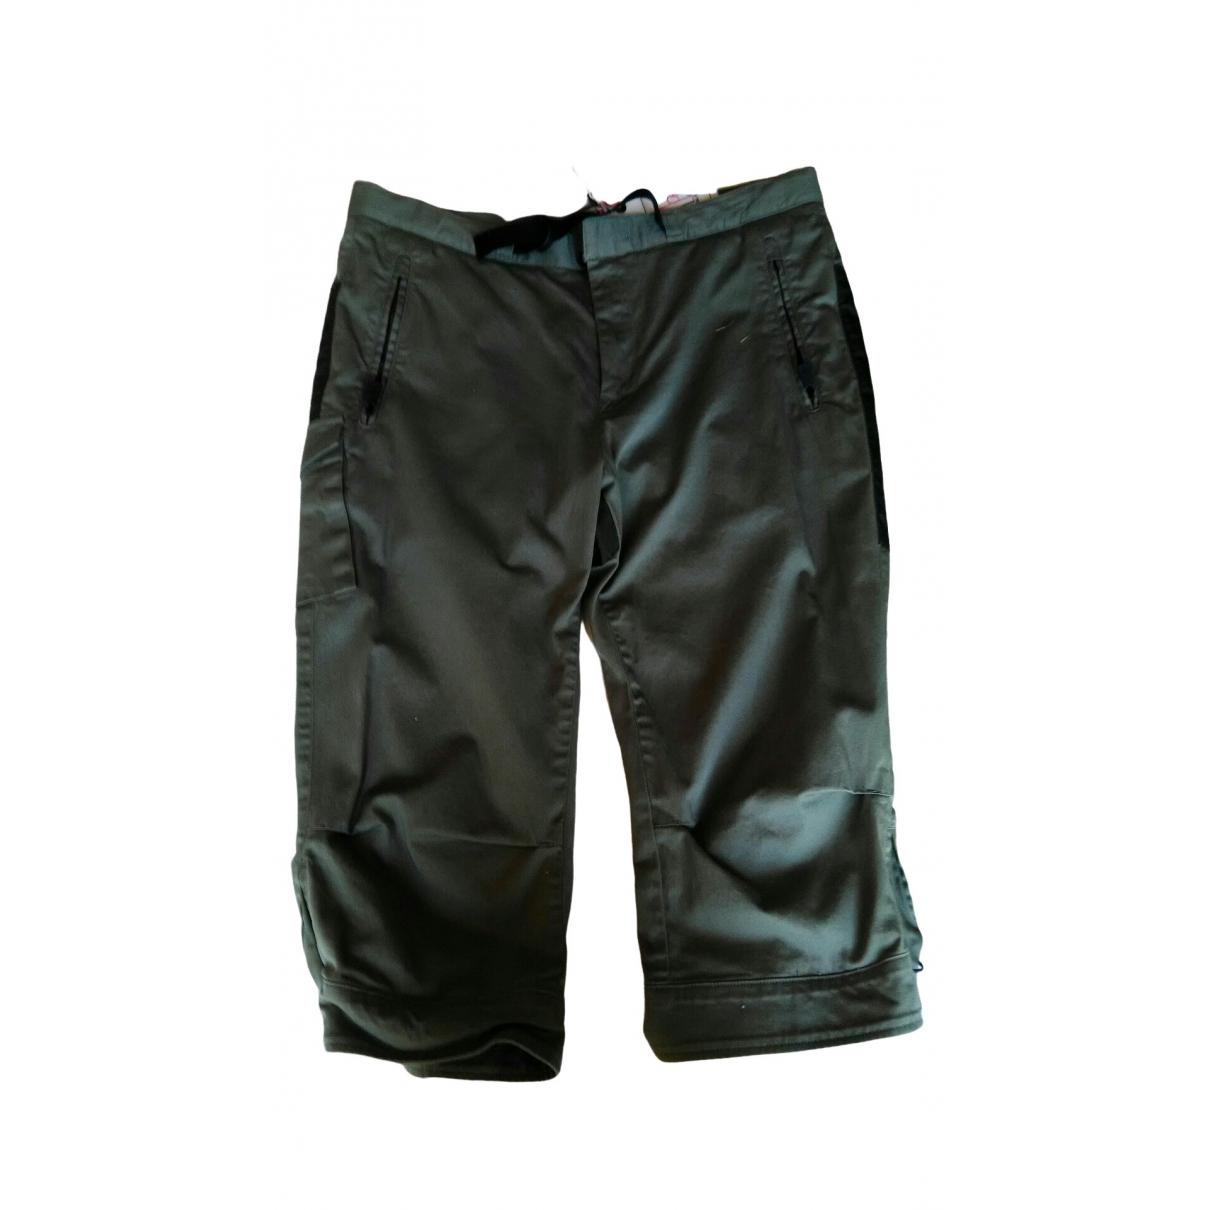 Moncler \N Shorts in  Gruen Baumwolle